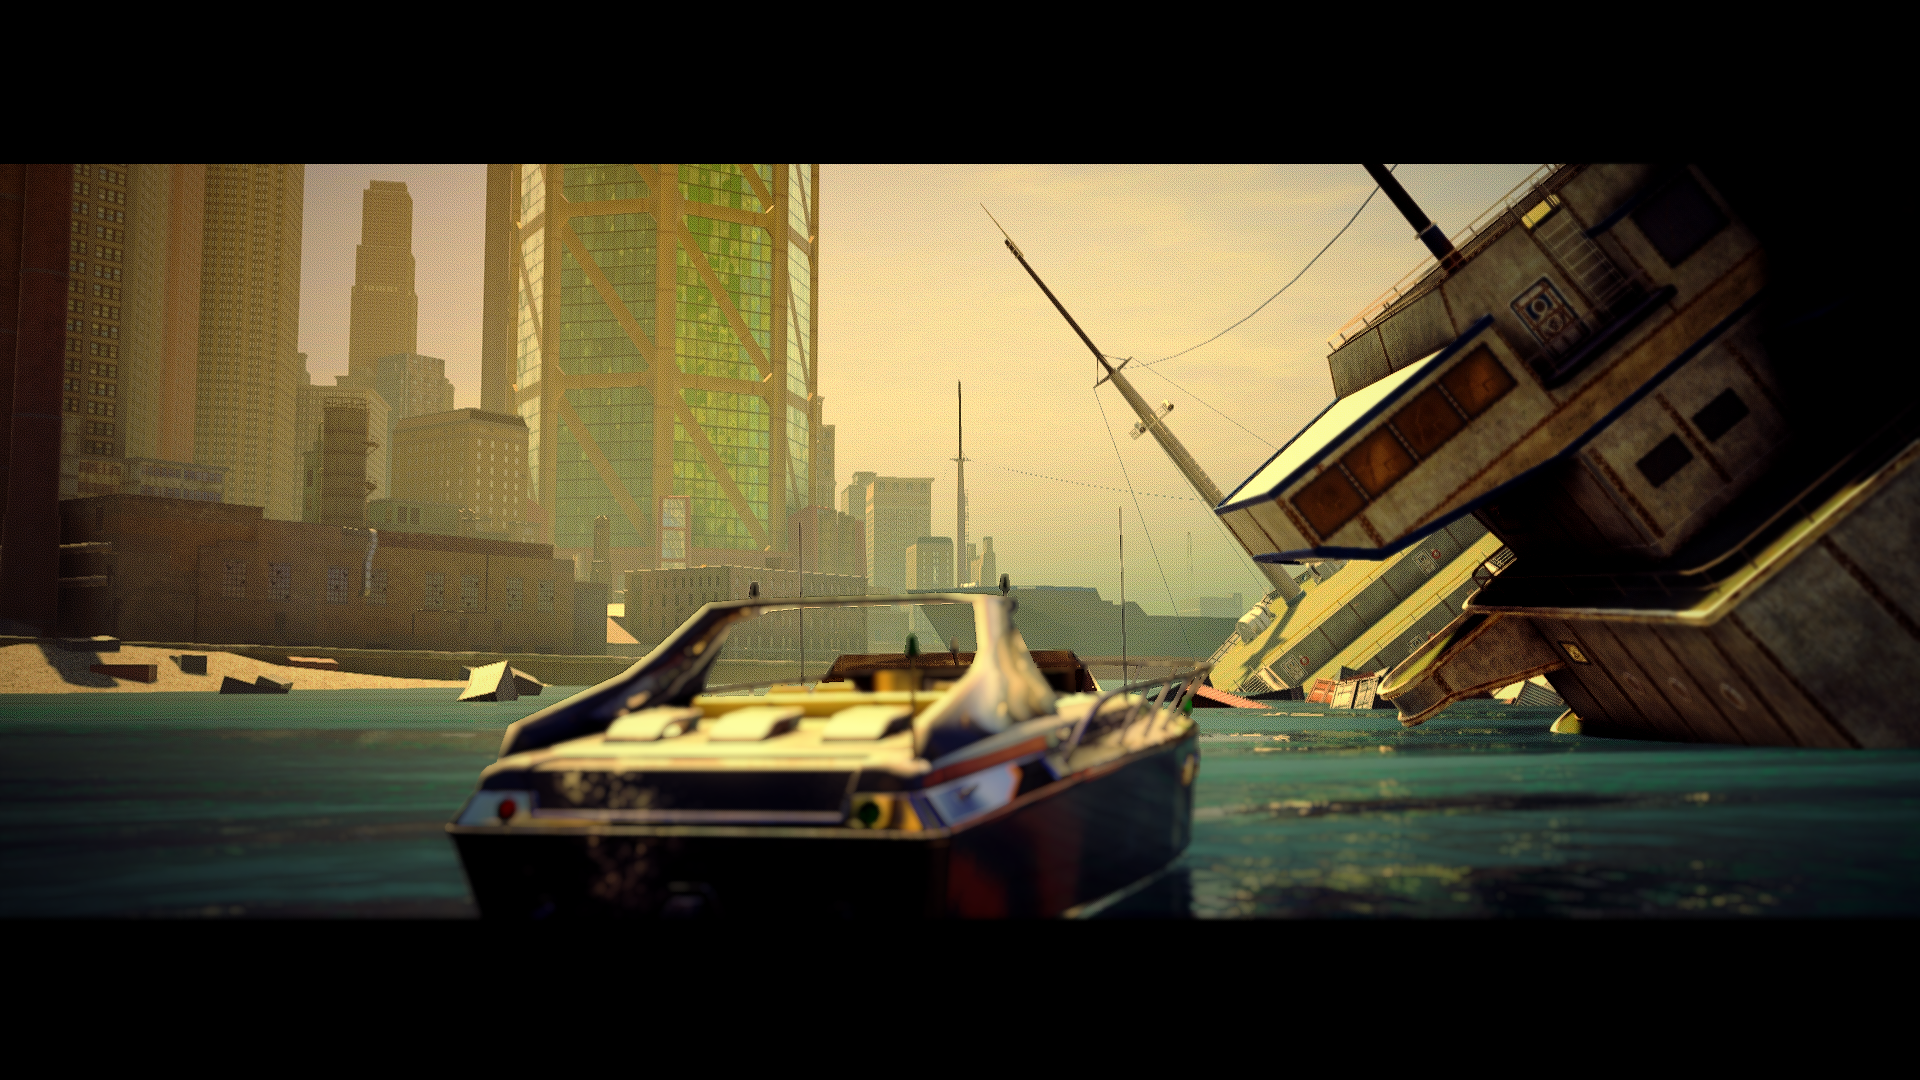 Saints Row  The Third Remastered Screenshot 2020.05.27 - 23.29.11.12.png